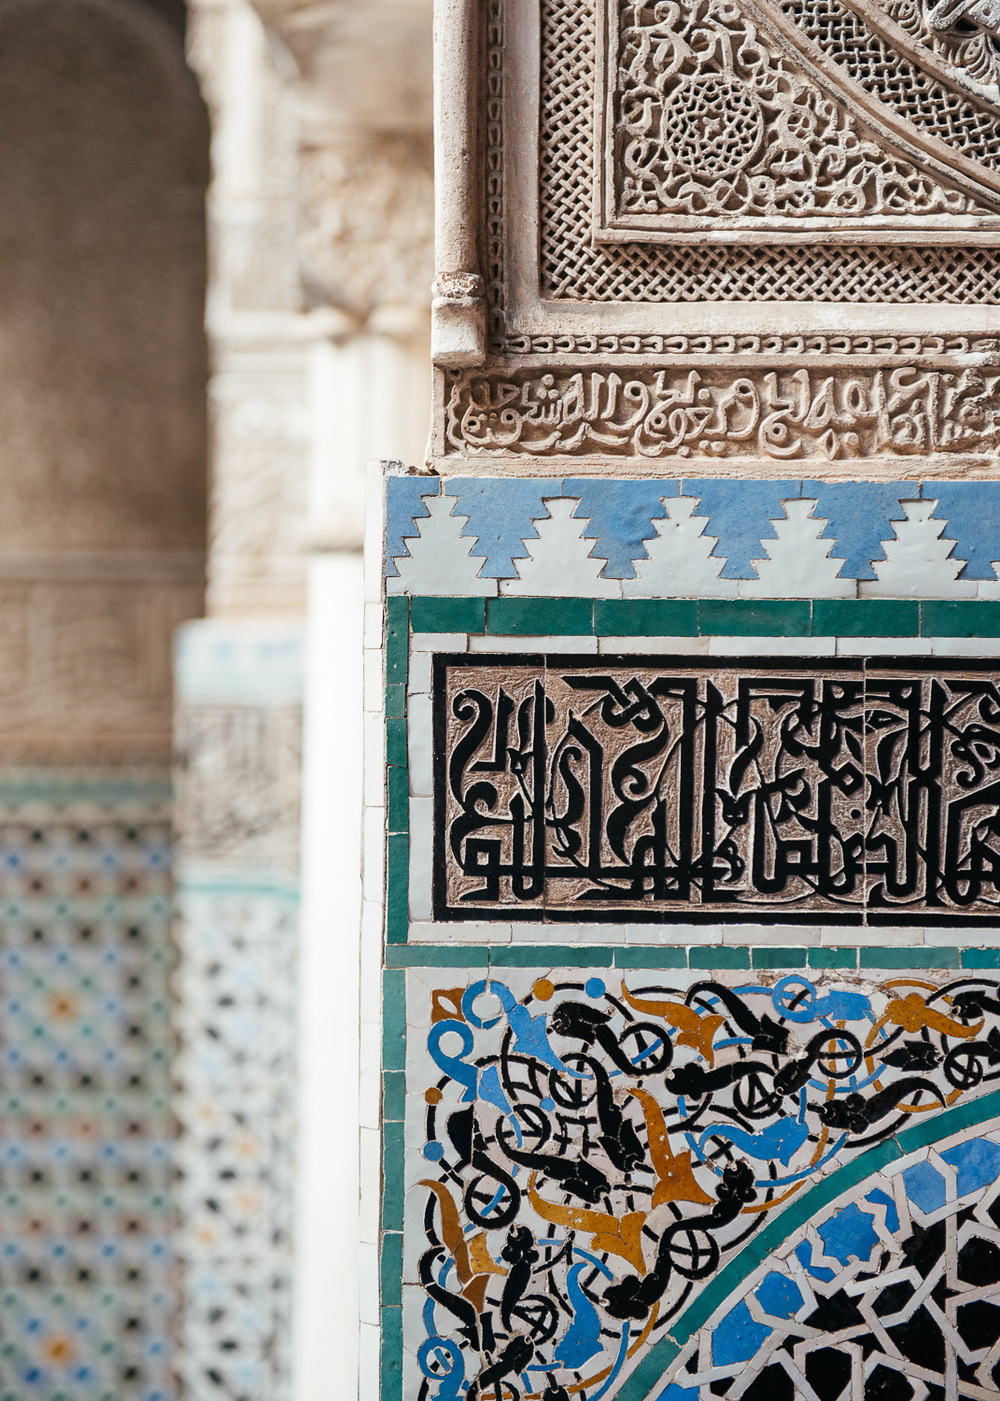 Detail of the Al-Attarine Madrasa tile work.